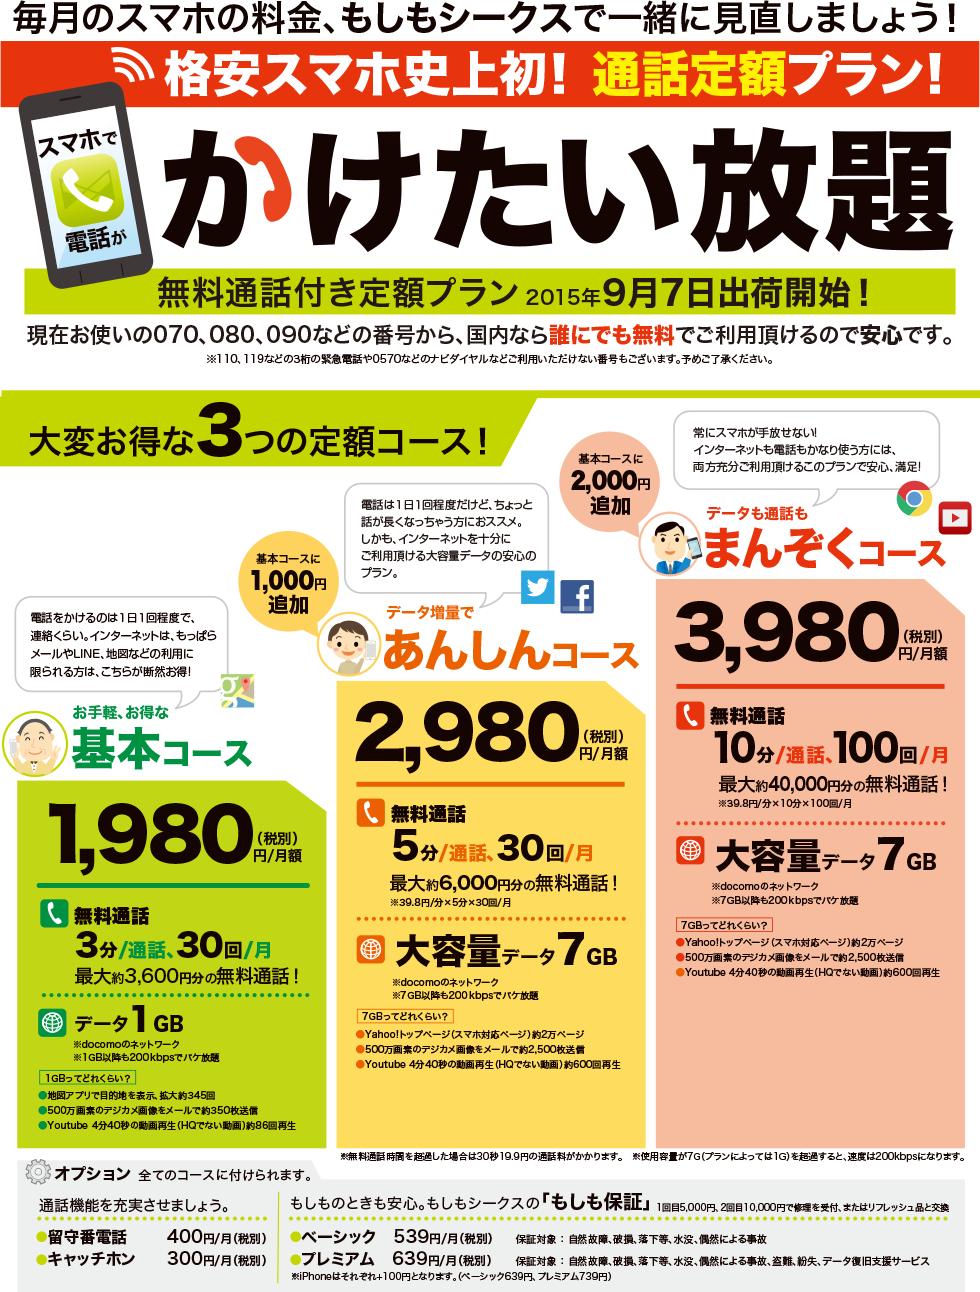 img_0810_TOP_kaketaiho-dai